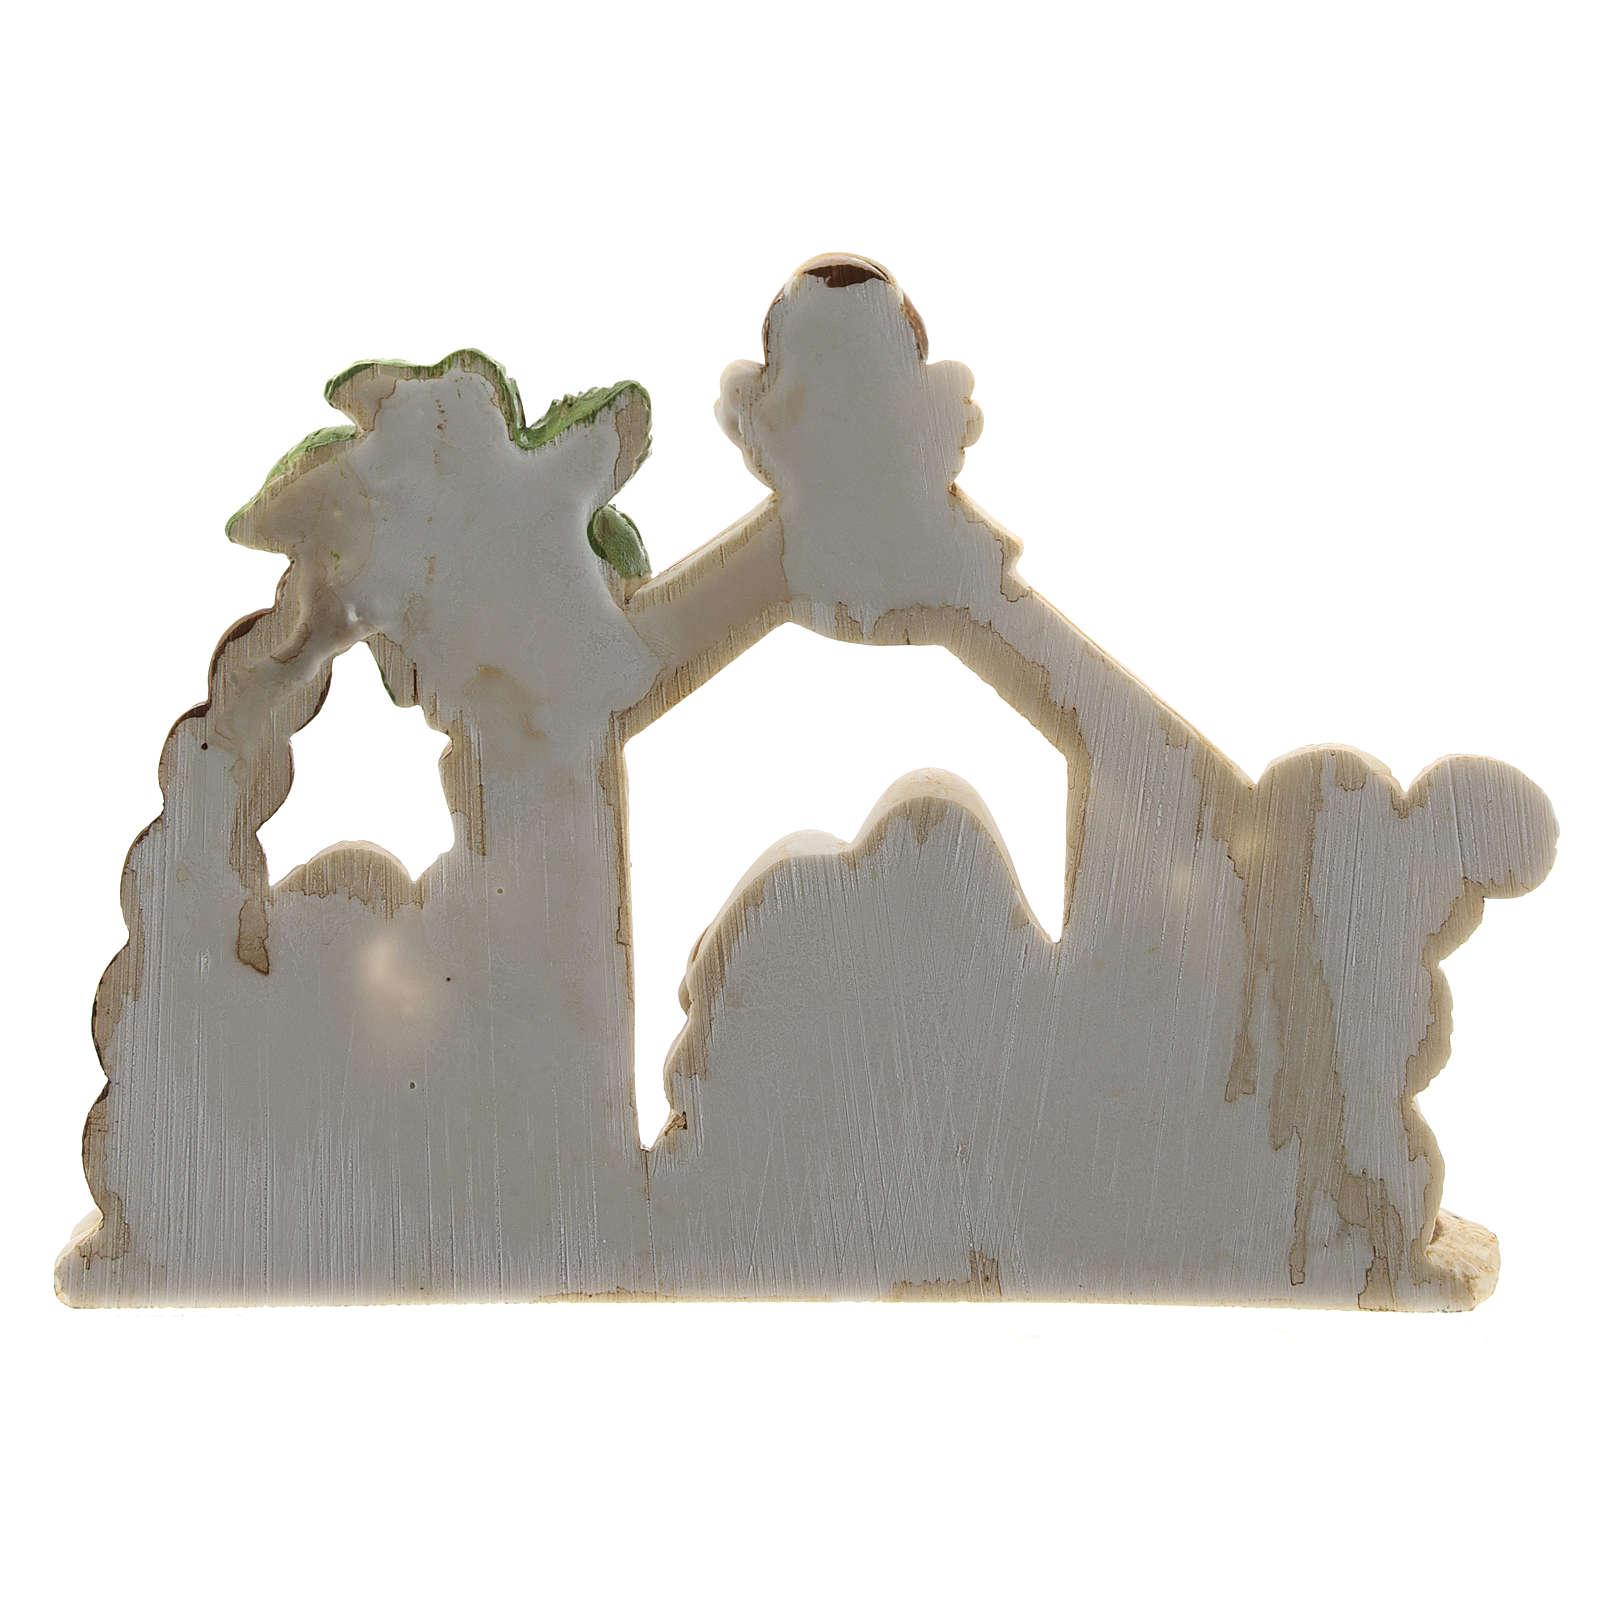 Presepe capanna resina 8 personaggi 15x10 cm linea bambini 4